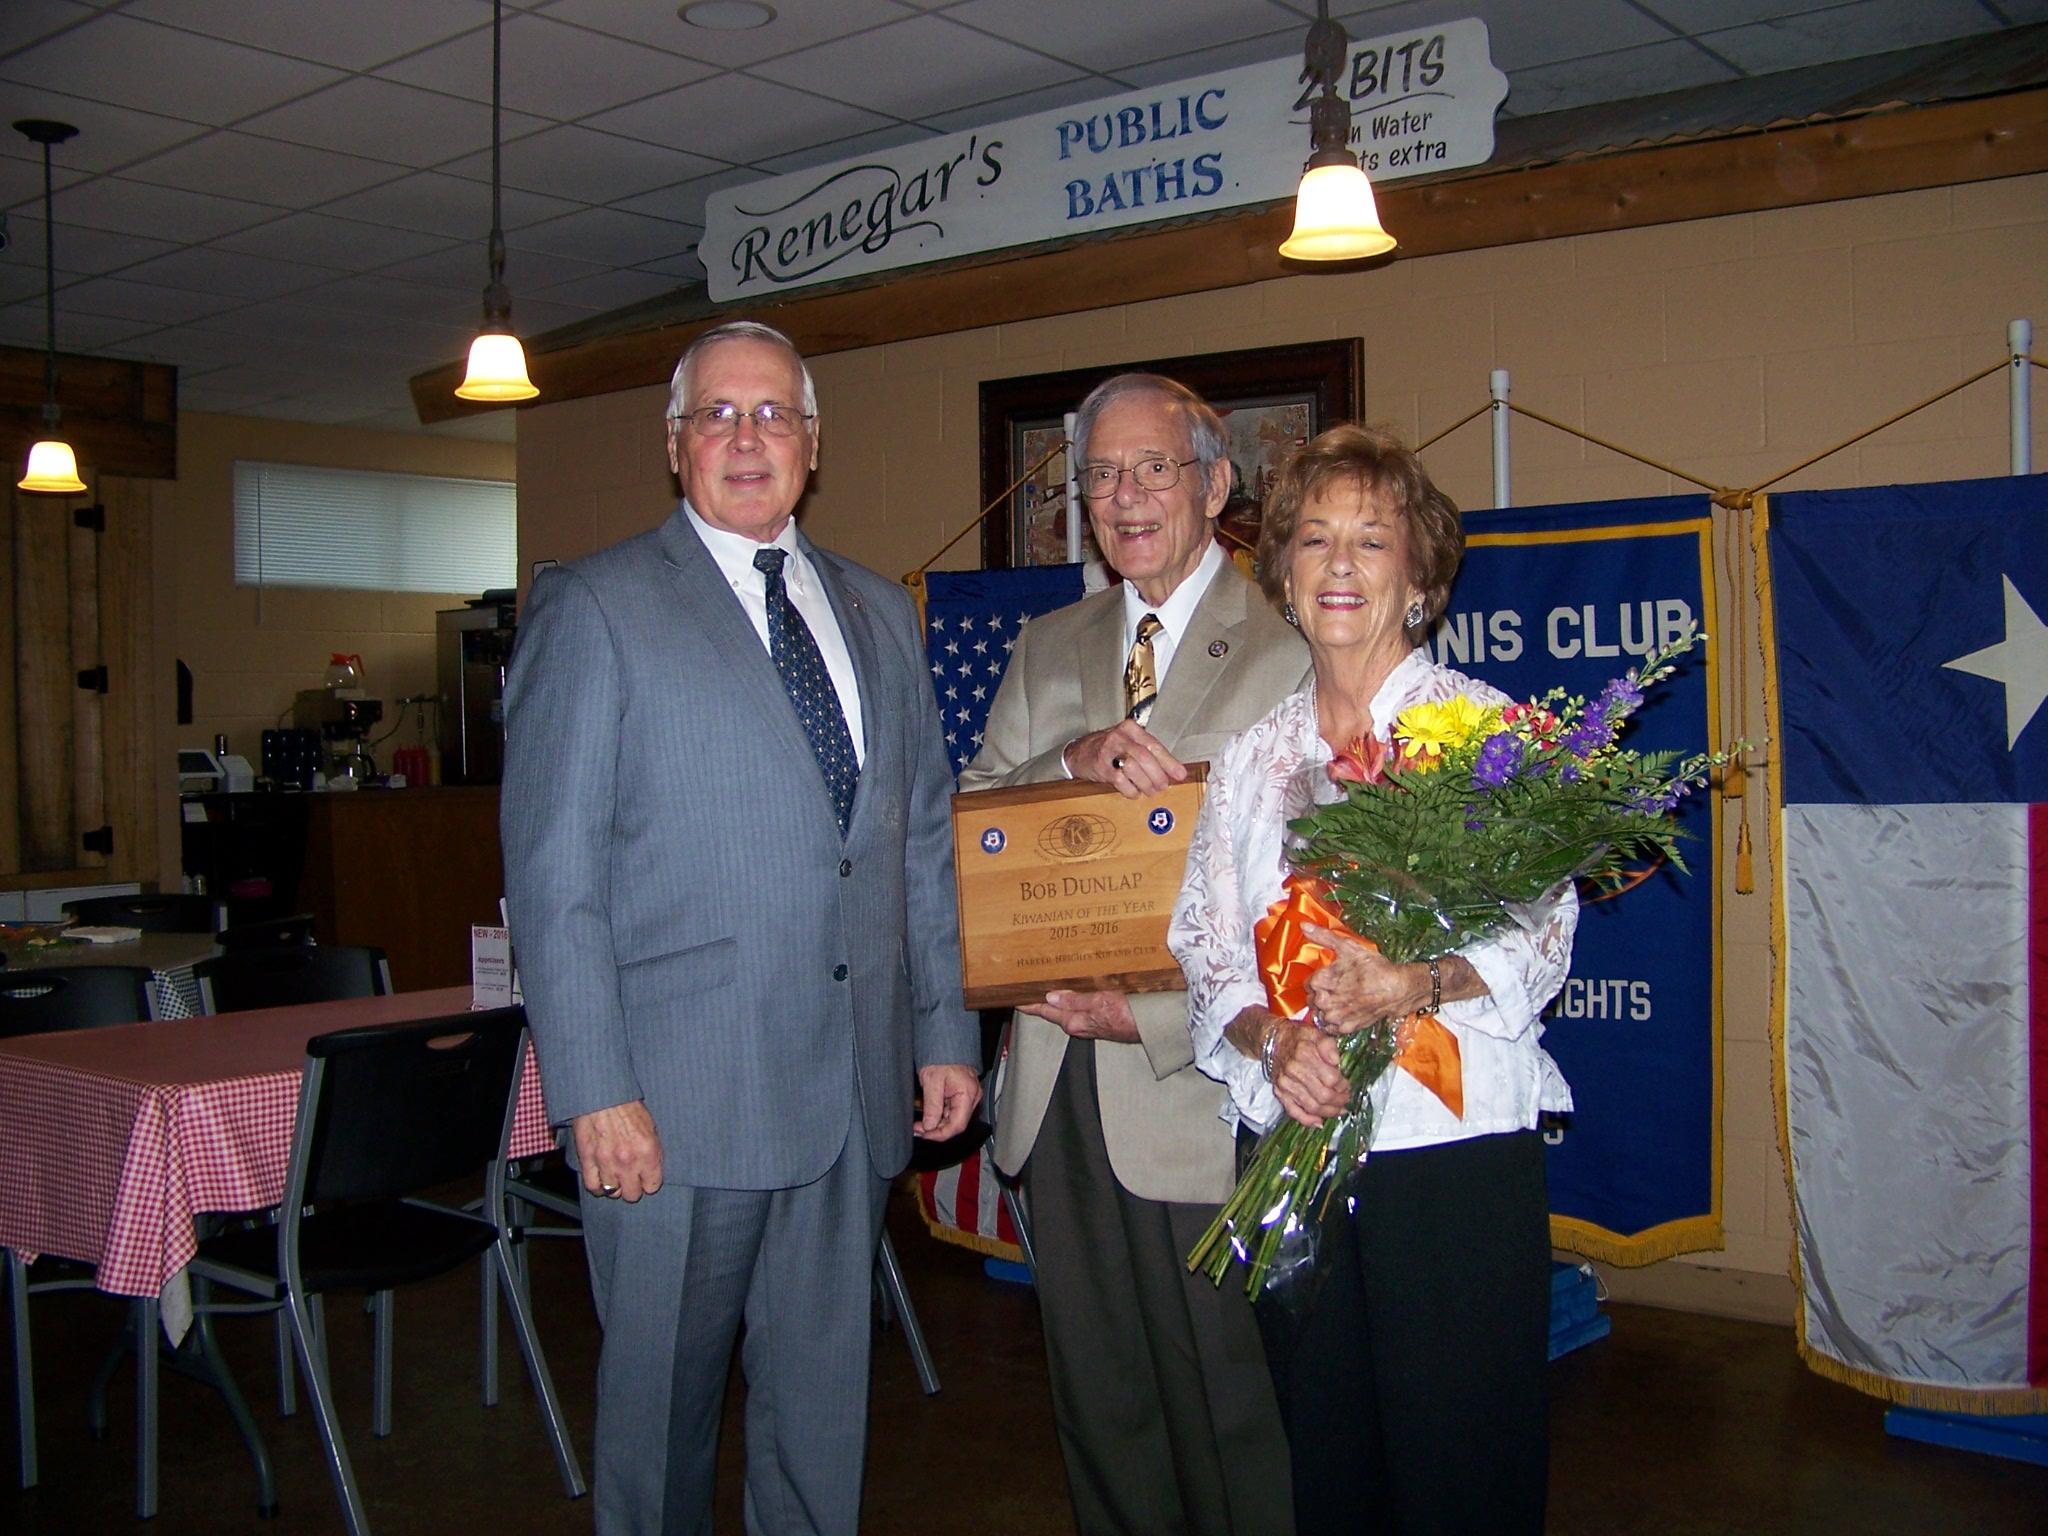 David McClure, Bob Dunlap & Sue Dunlap